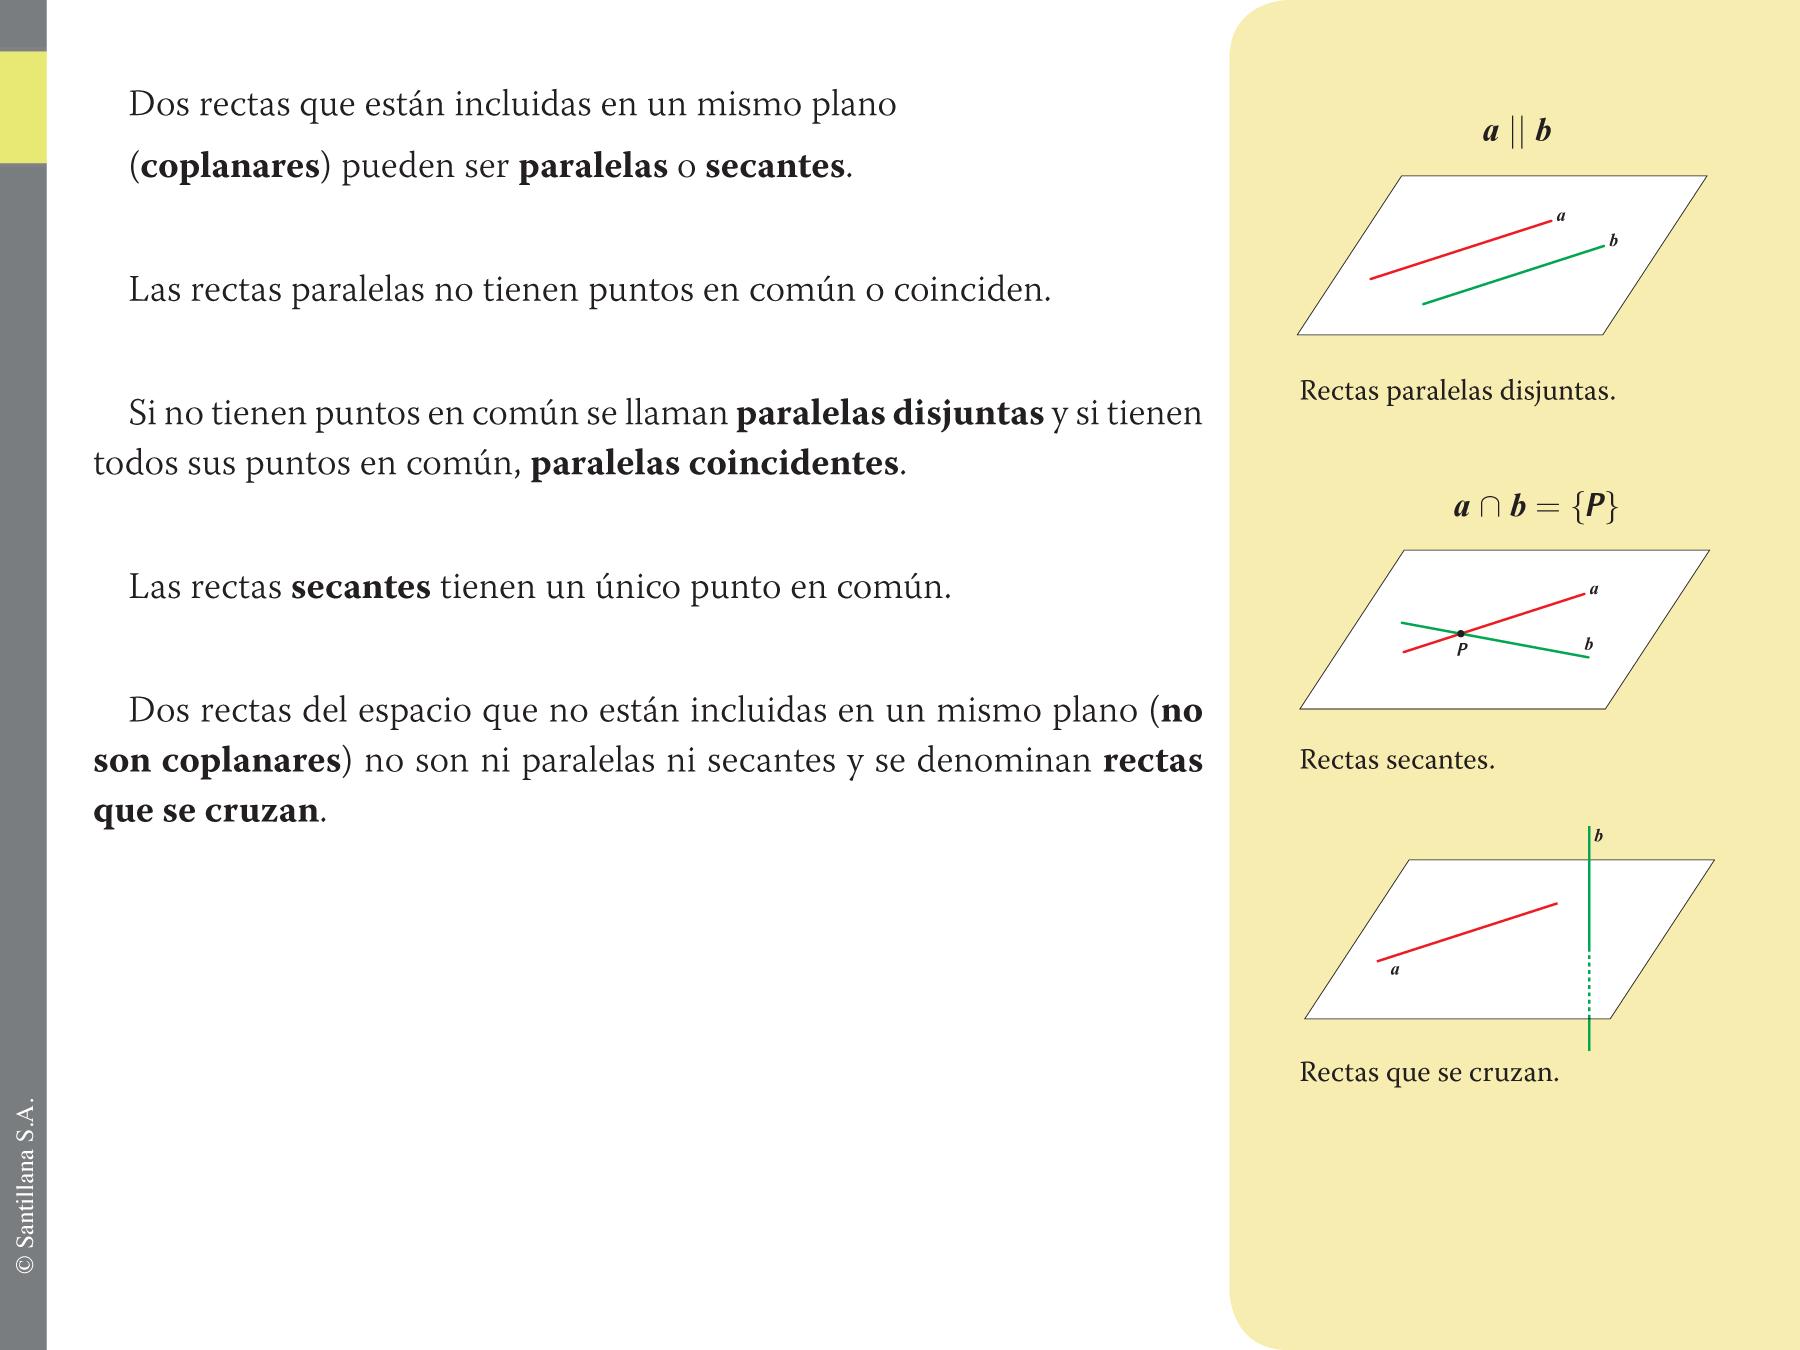 e-Lecciones - Santillana